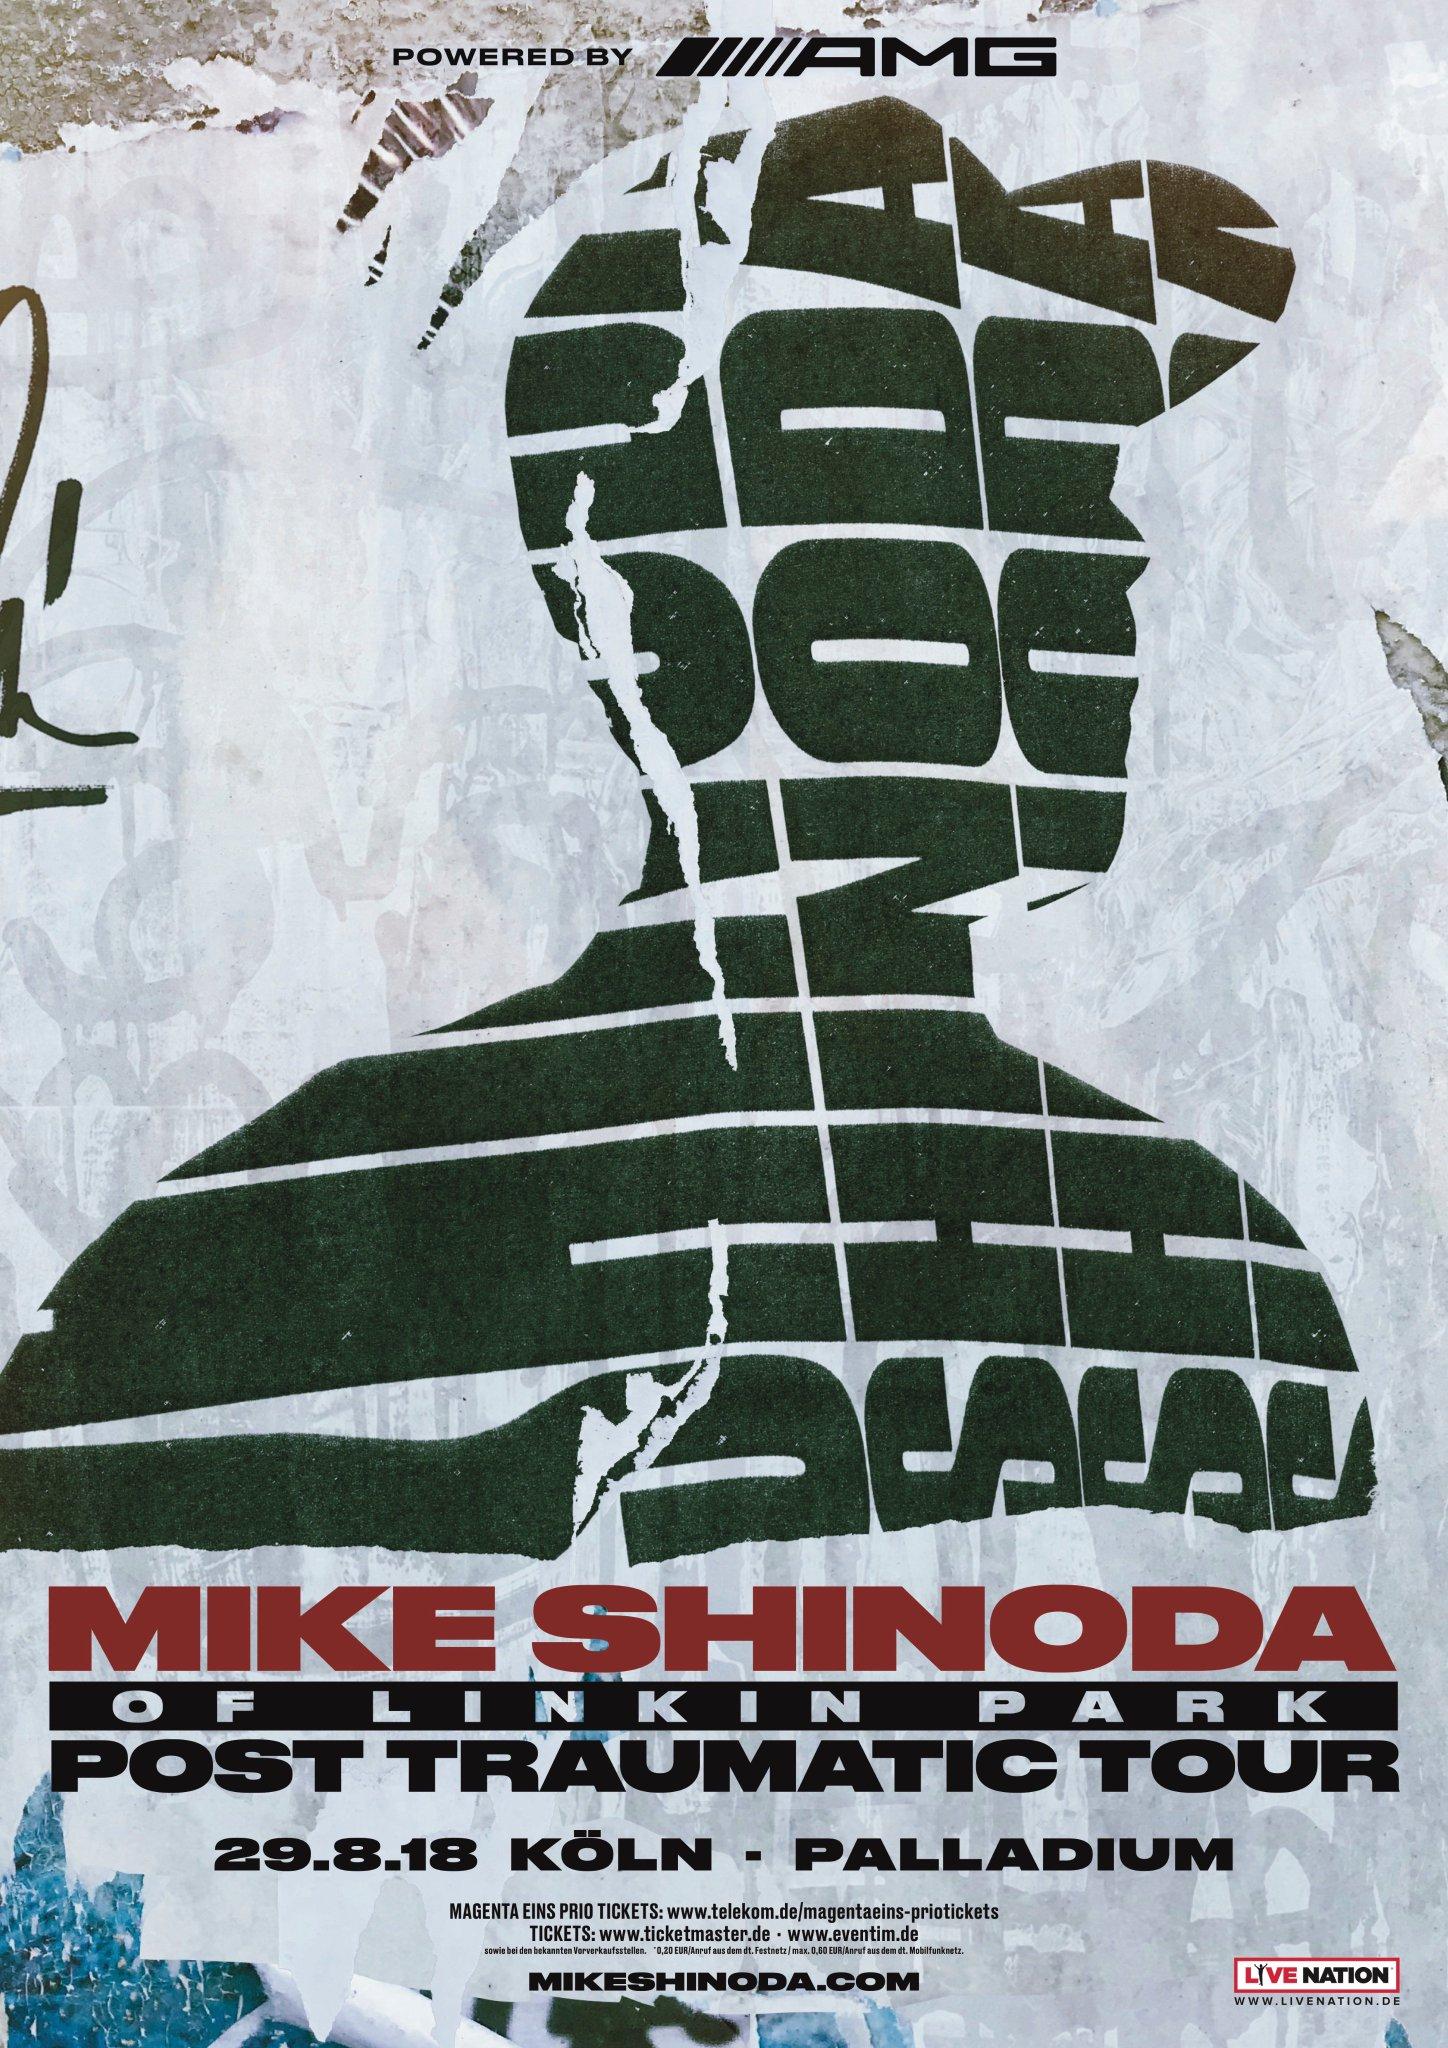 Mike Shinoda On Twitter Posttraumatictour Cologne Germany August 29 Lpu Pre Sale June 12 10am Cest Public On Sale June 15 10am Cest Tickets Info Https T Co S7hmgv1lx8 Lpu